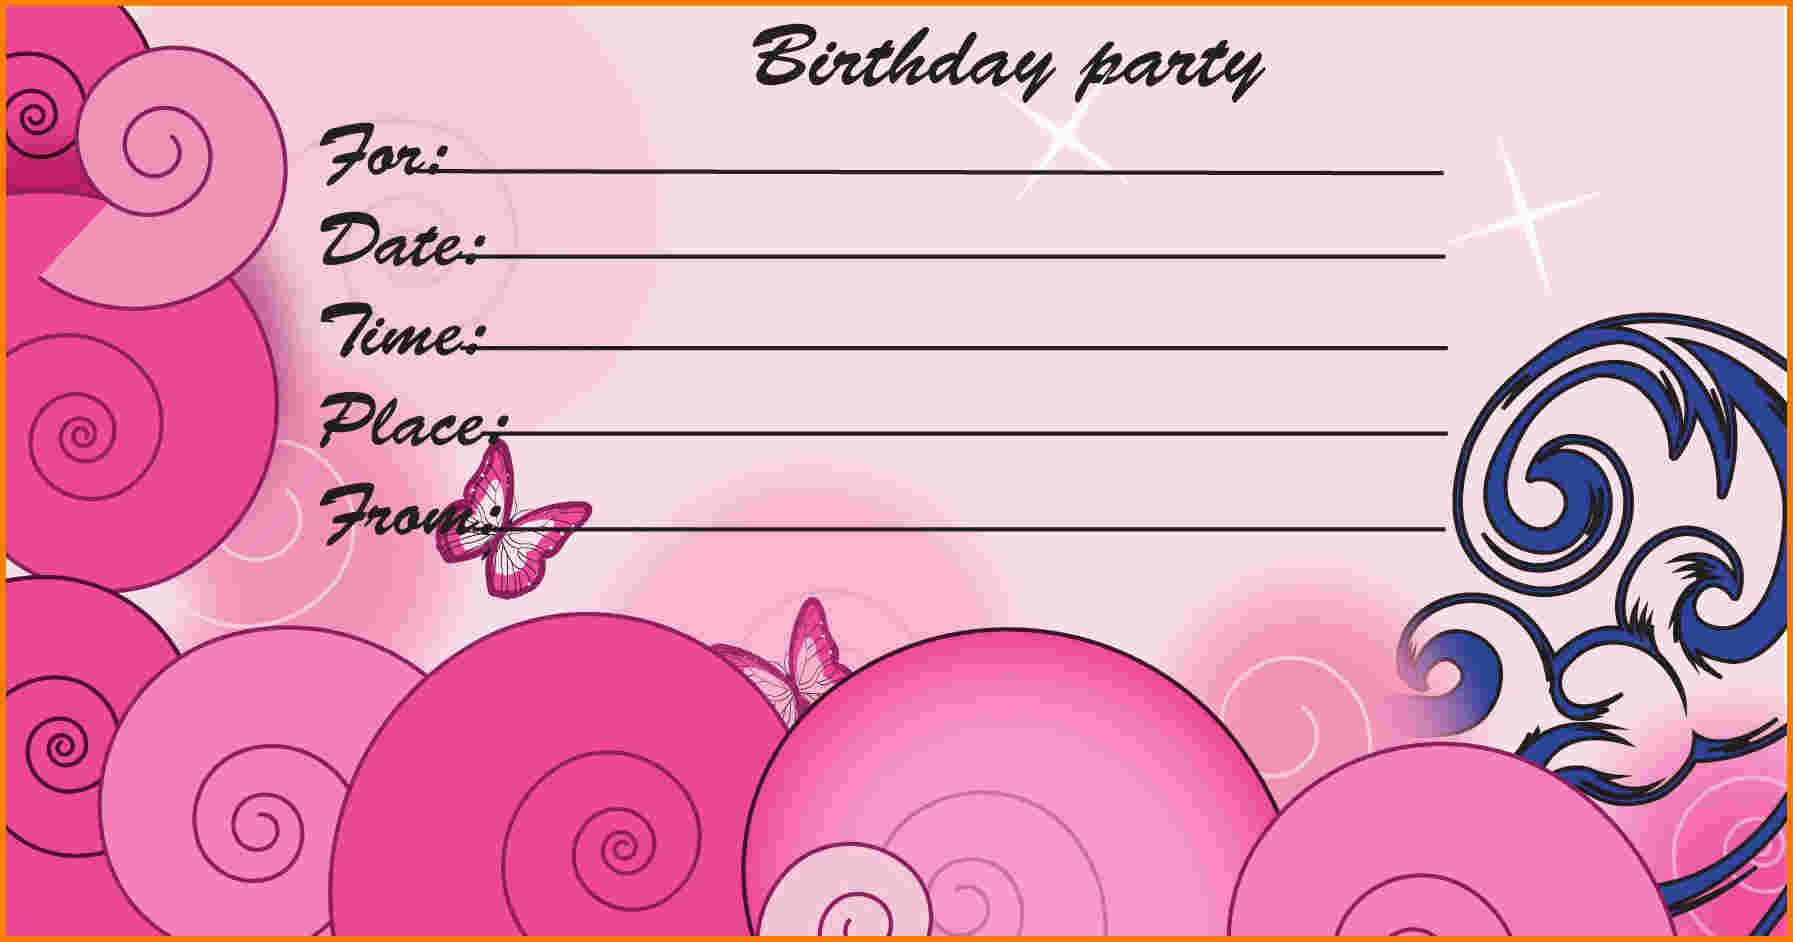 Free Printable Kids Birthday Party Invitations Templates